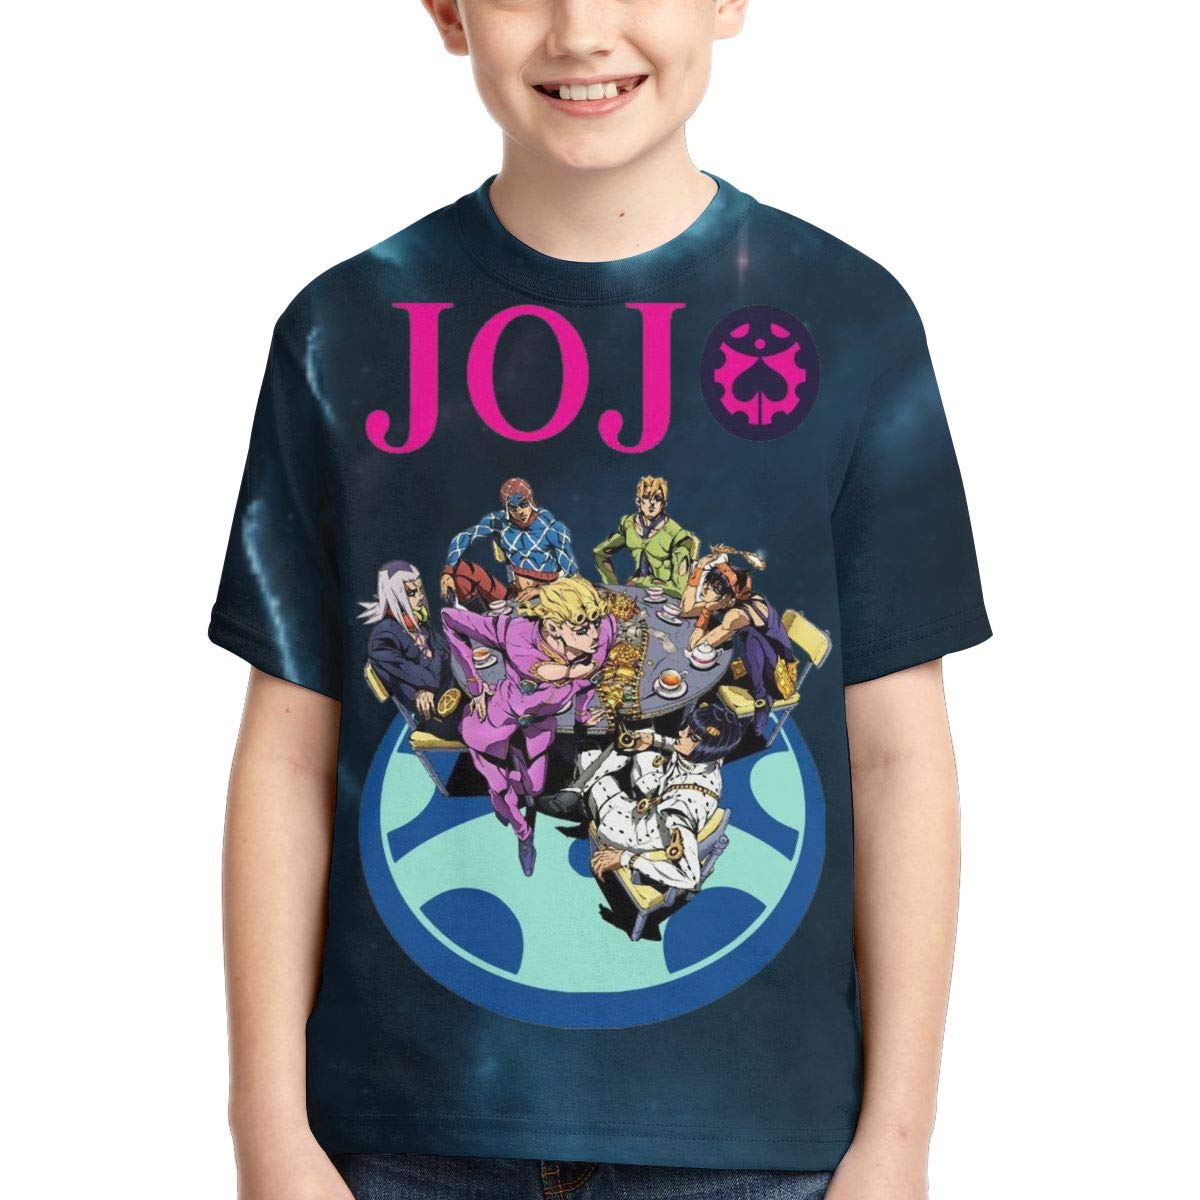 Zengqinglove Boys,Girls,Youth JoJos Bizarre Adventure Tshirts